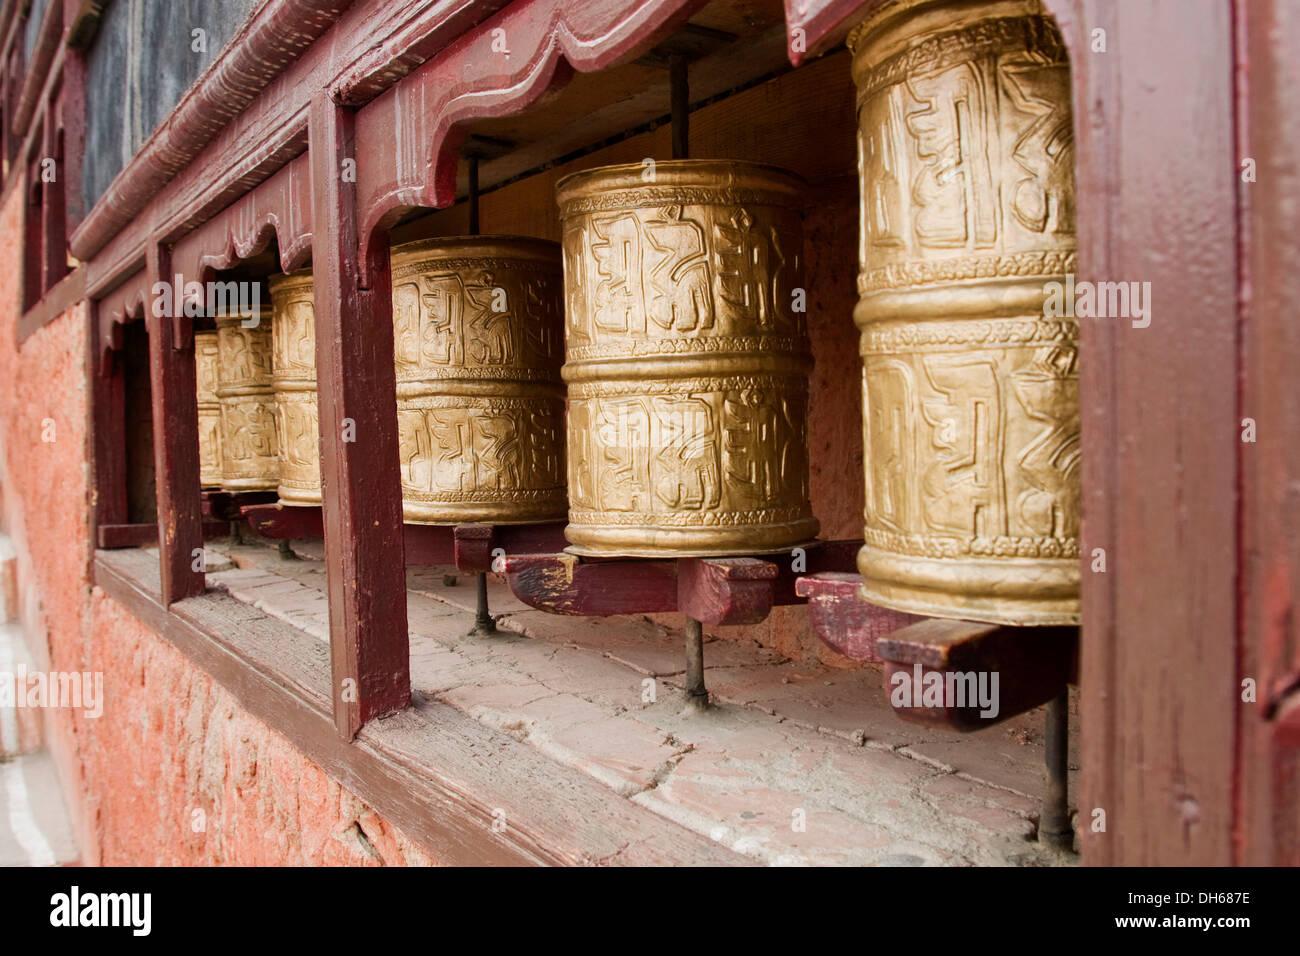 Tibetan Buddhist monastery with prayer wheels in the Himalayan region near Leh, Ladakh, Himalaya, India, Asia - Stock Image